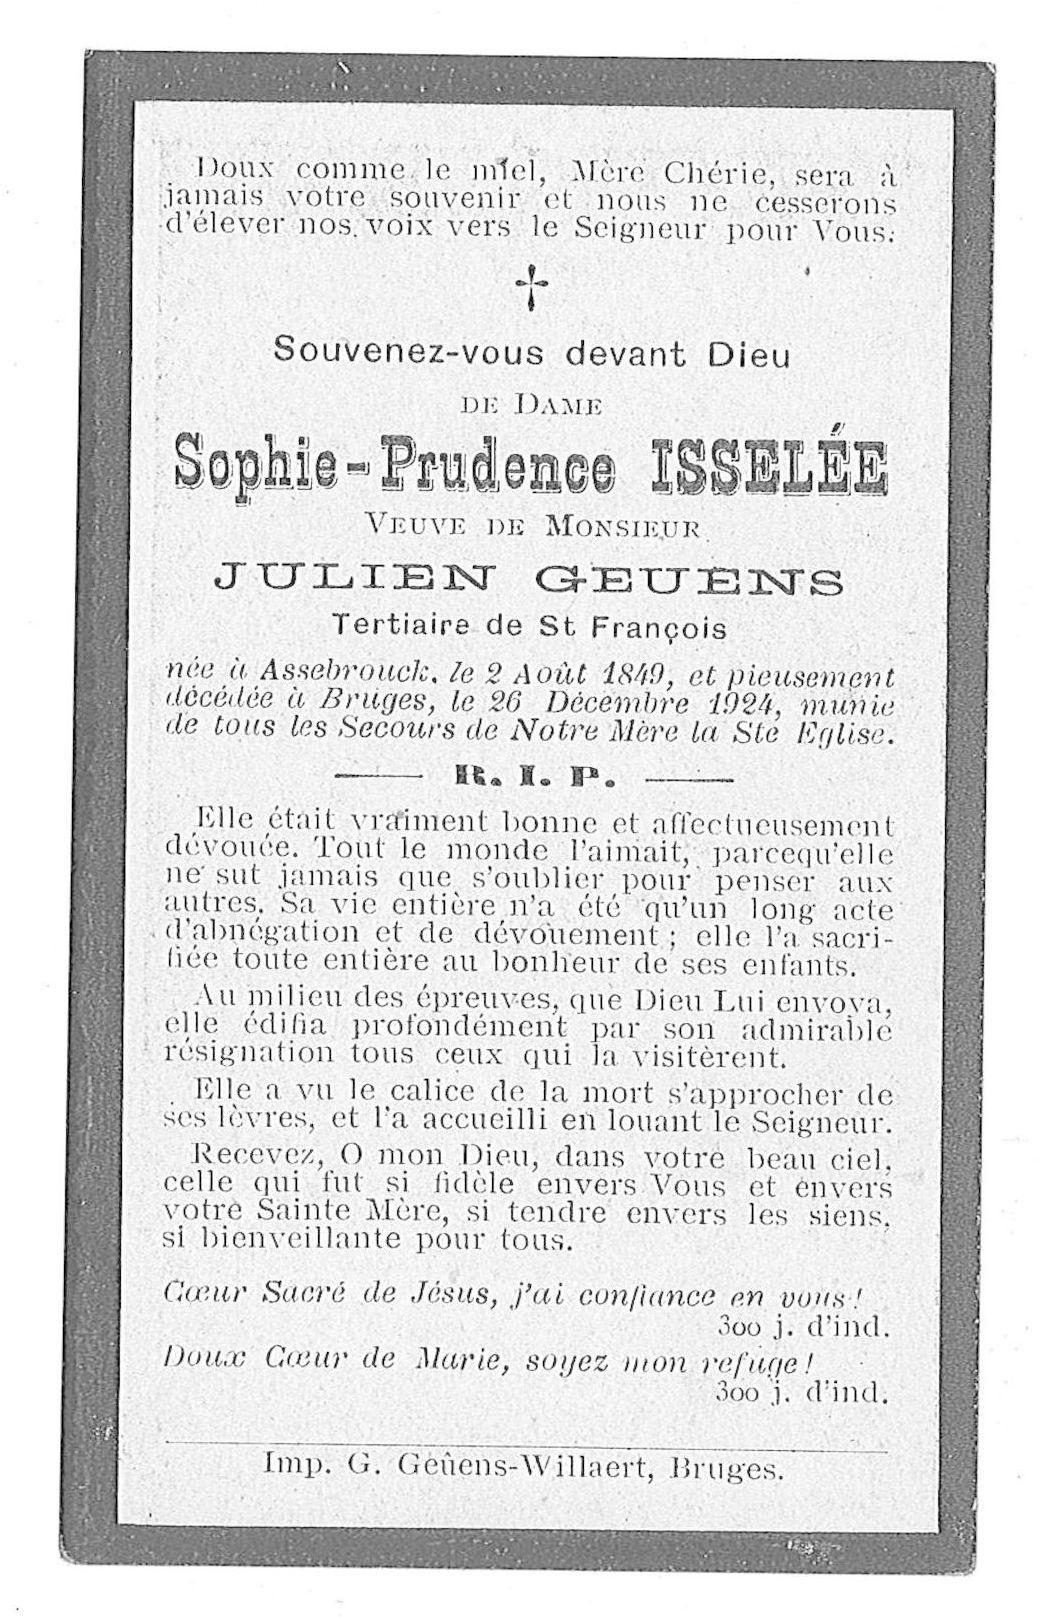 Sophie-Prudence Isselée